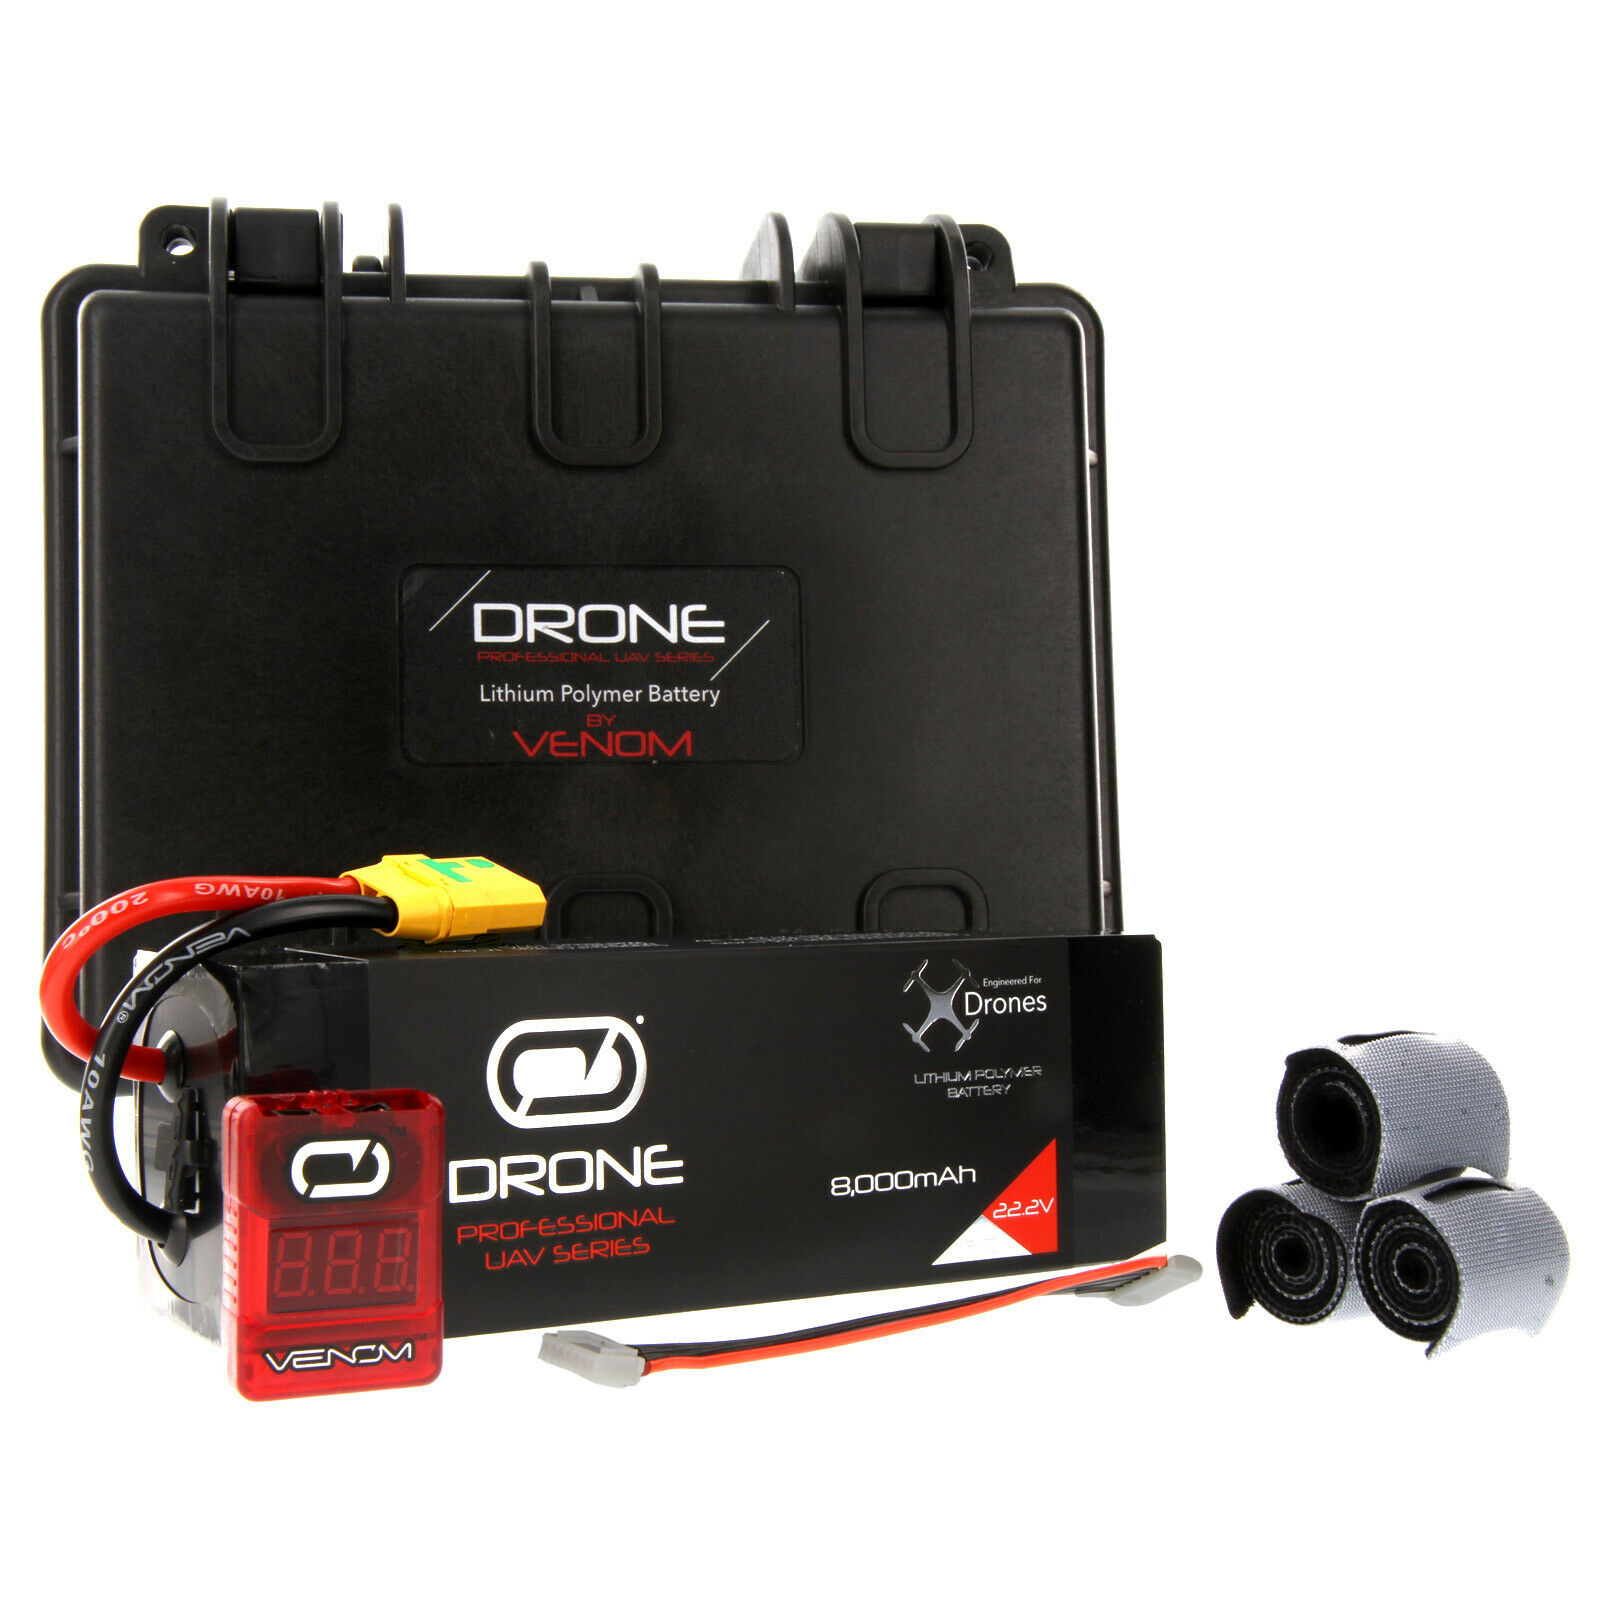 Venom 15C 6S 22.2V Batería Lipo Drone Pro 8000mAh  Aeronavics 8 Ti-QR